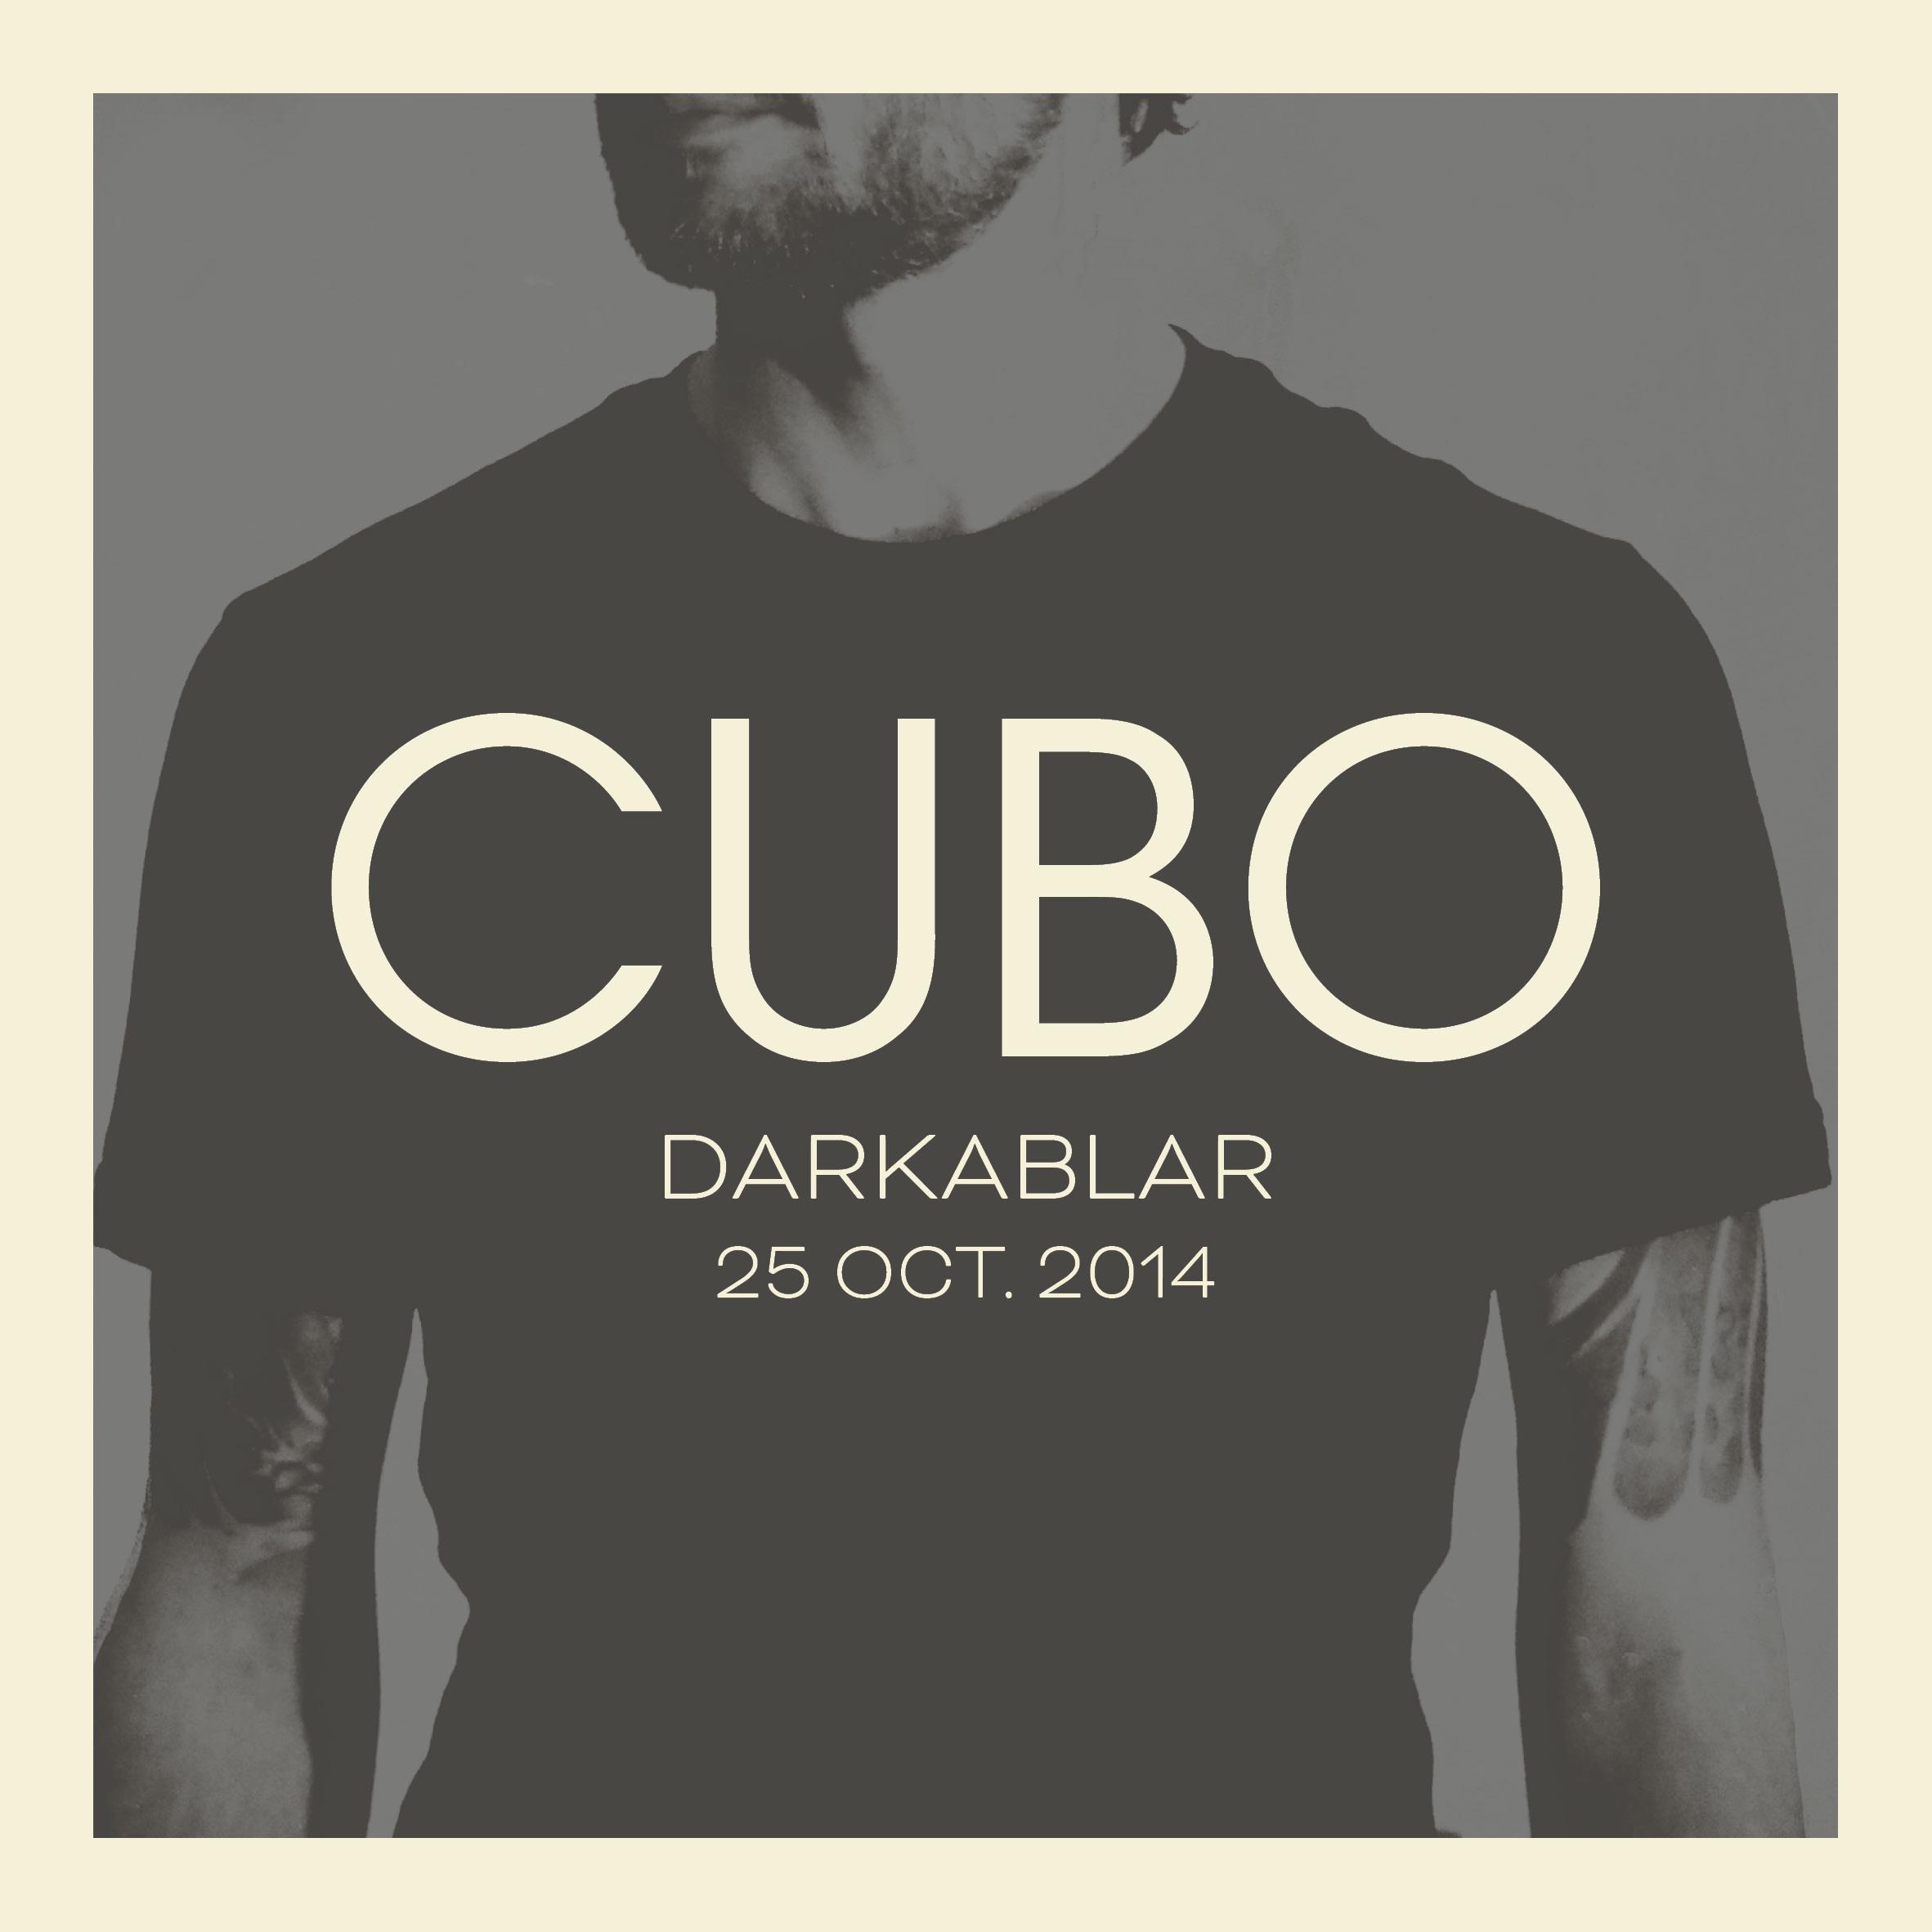 cubo, darkablar, silum soundz, dj cubo